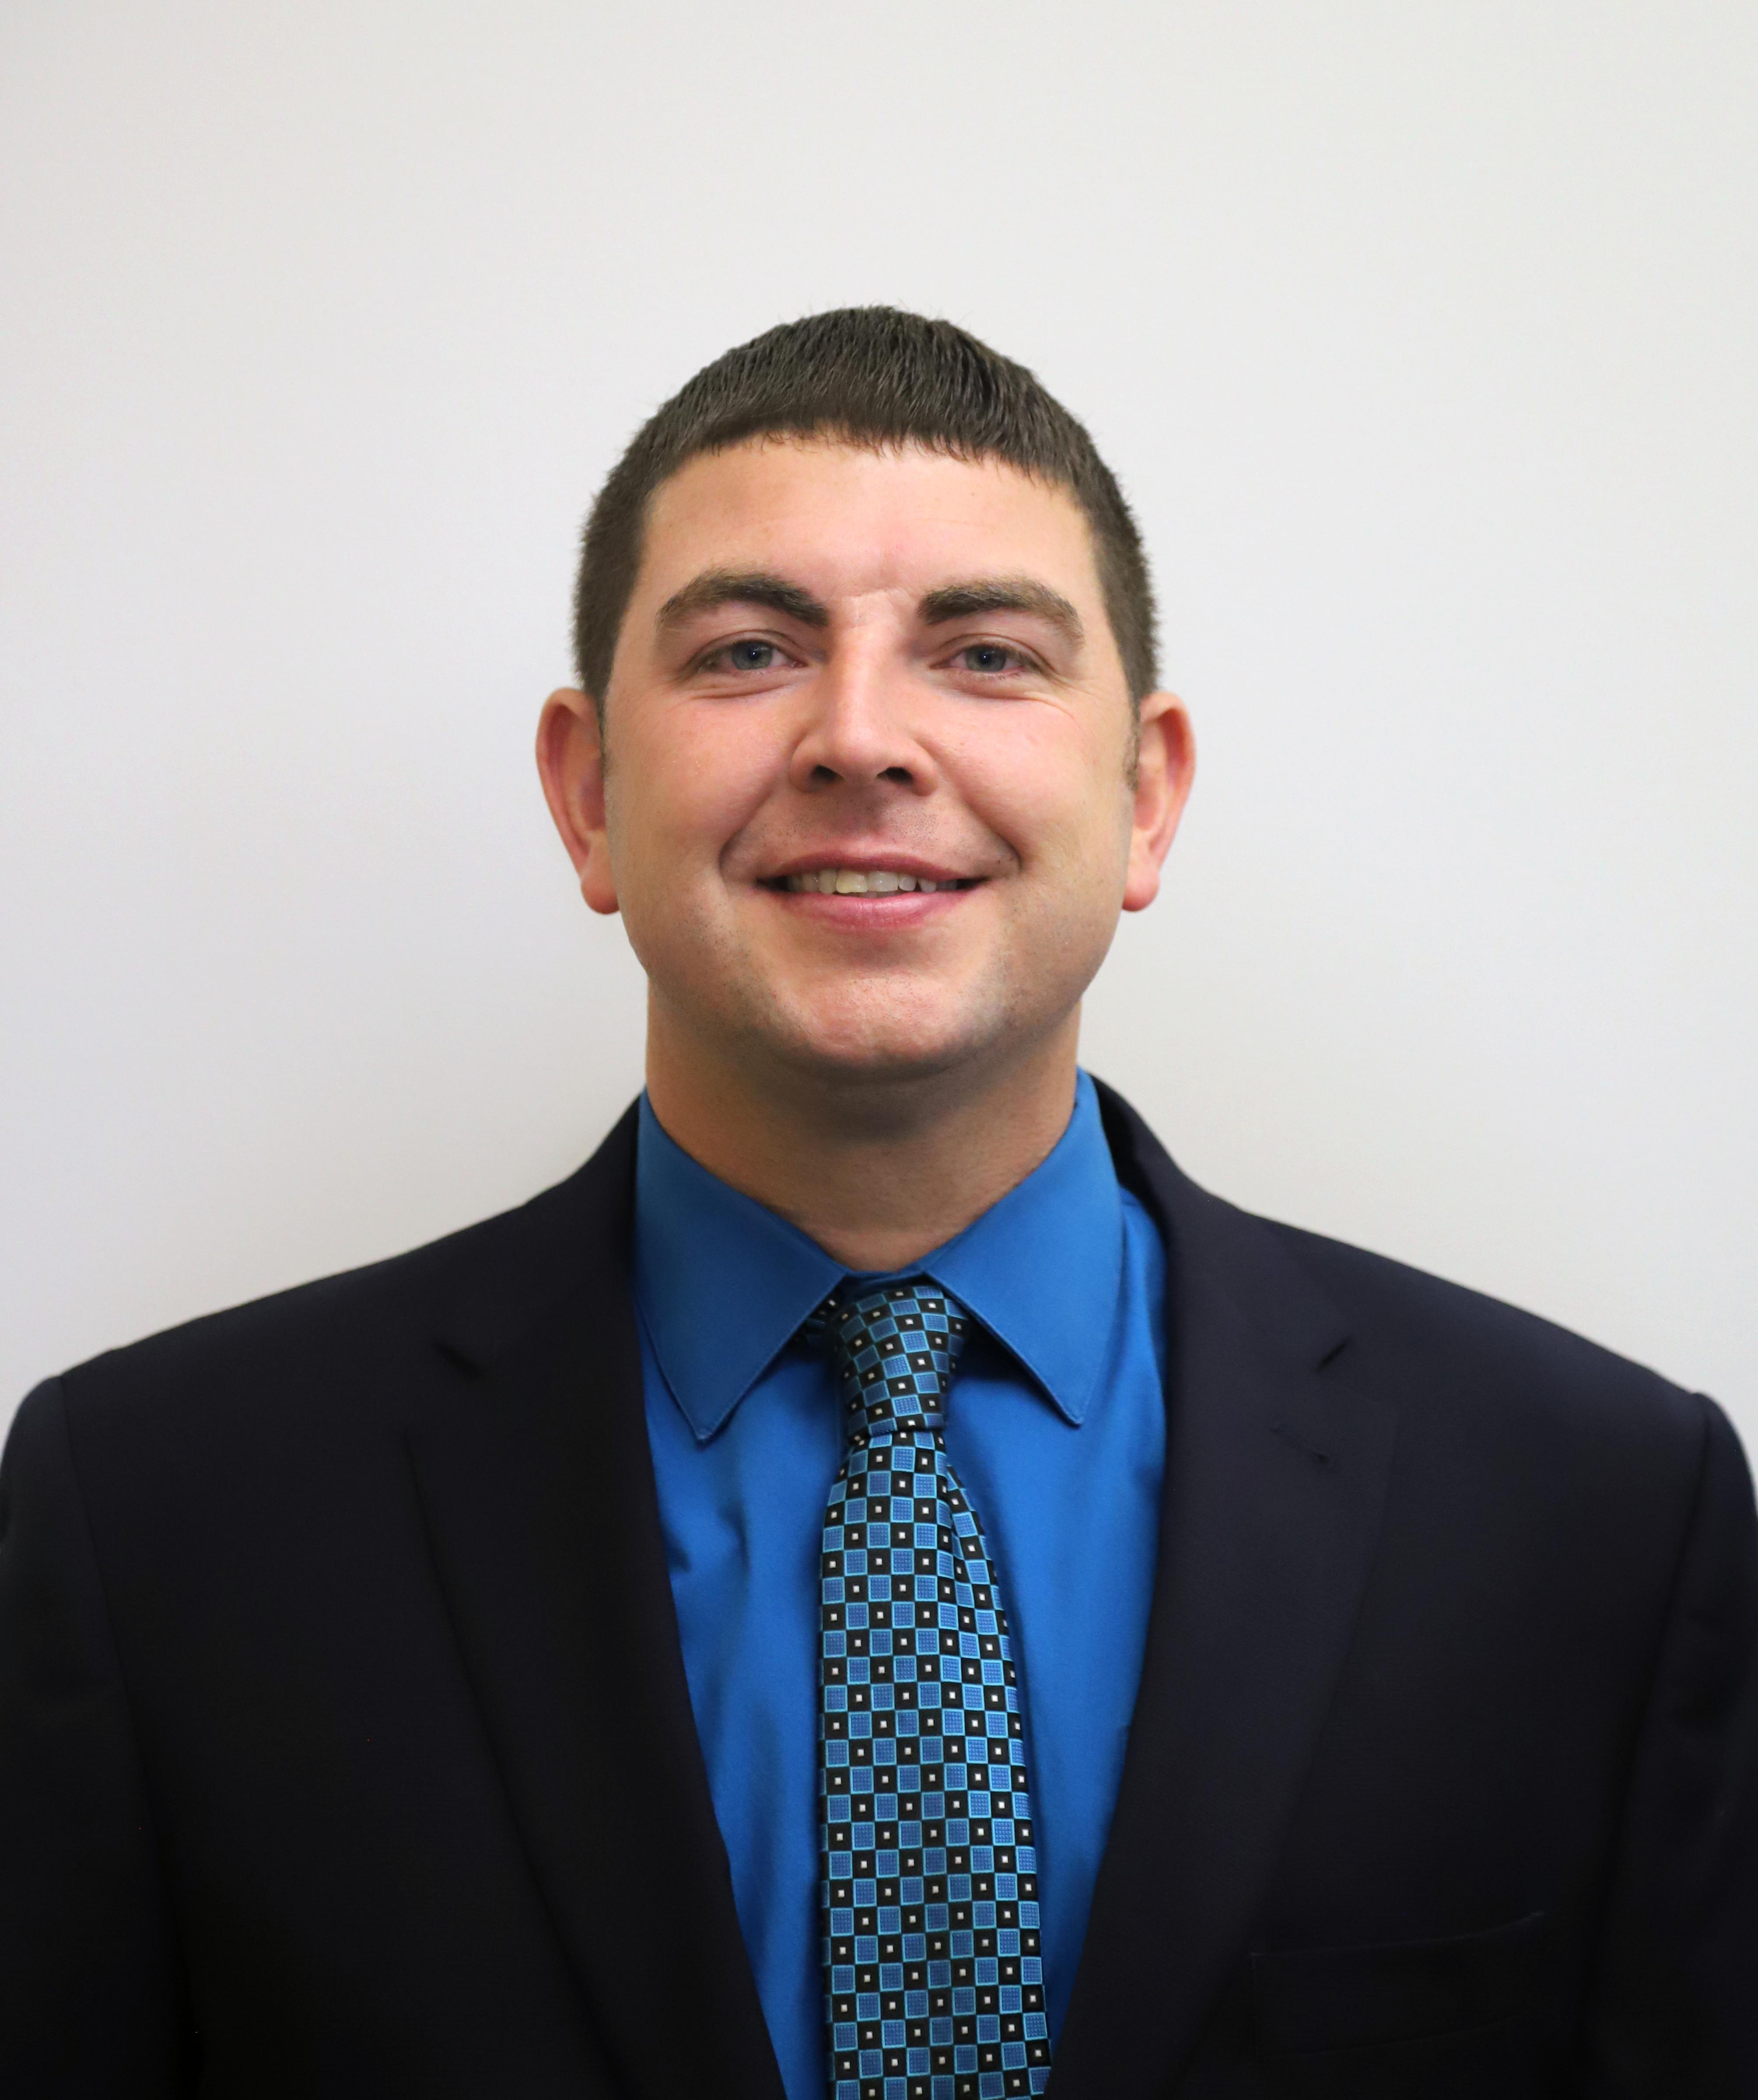 Michael Dandron Assist Principal